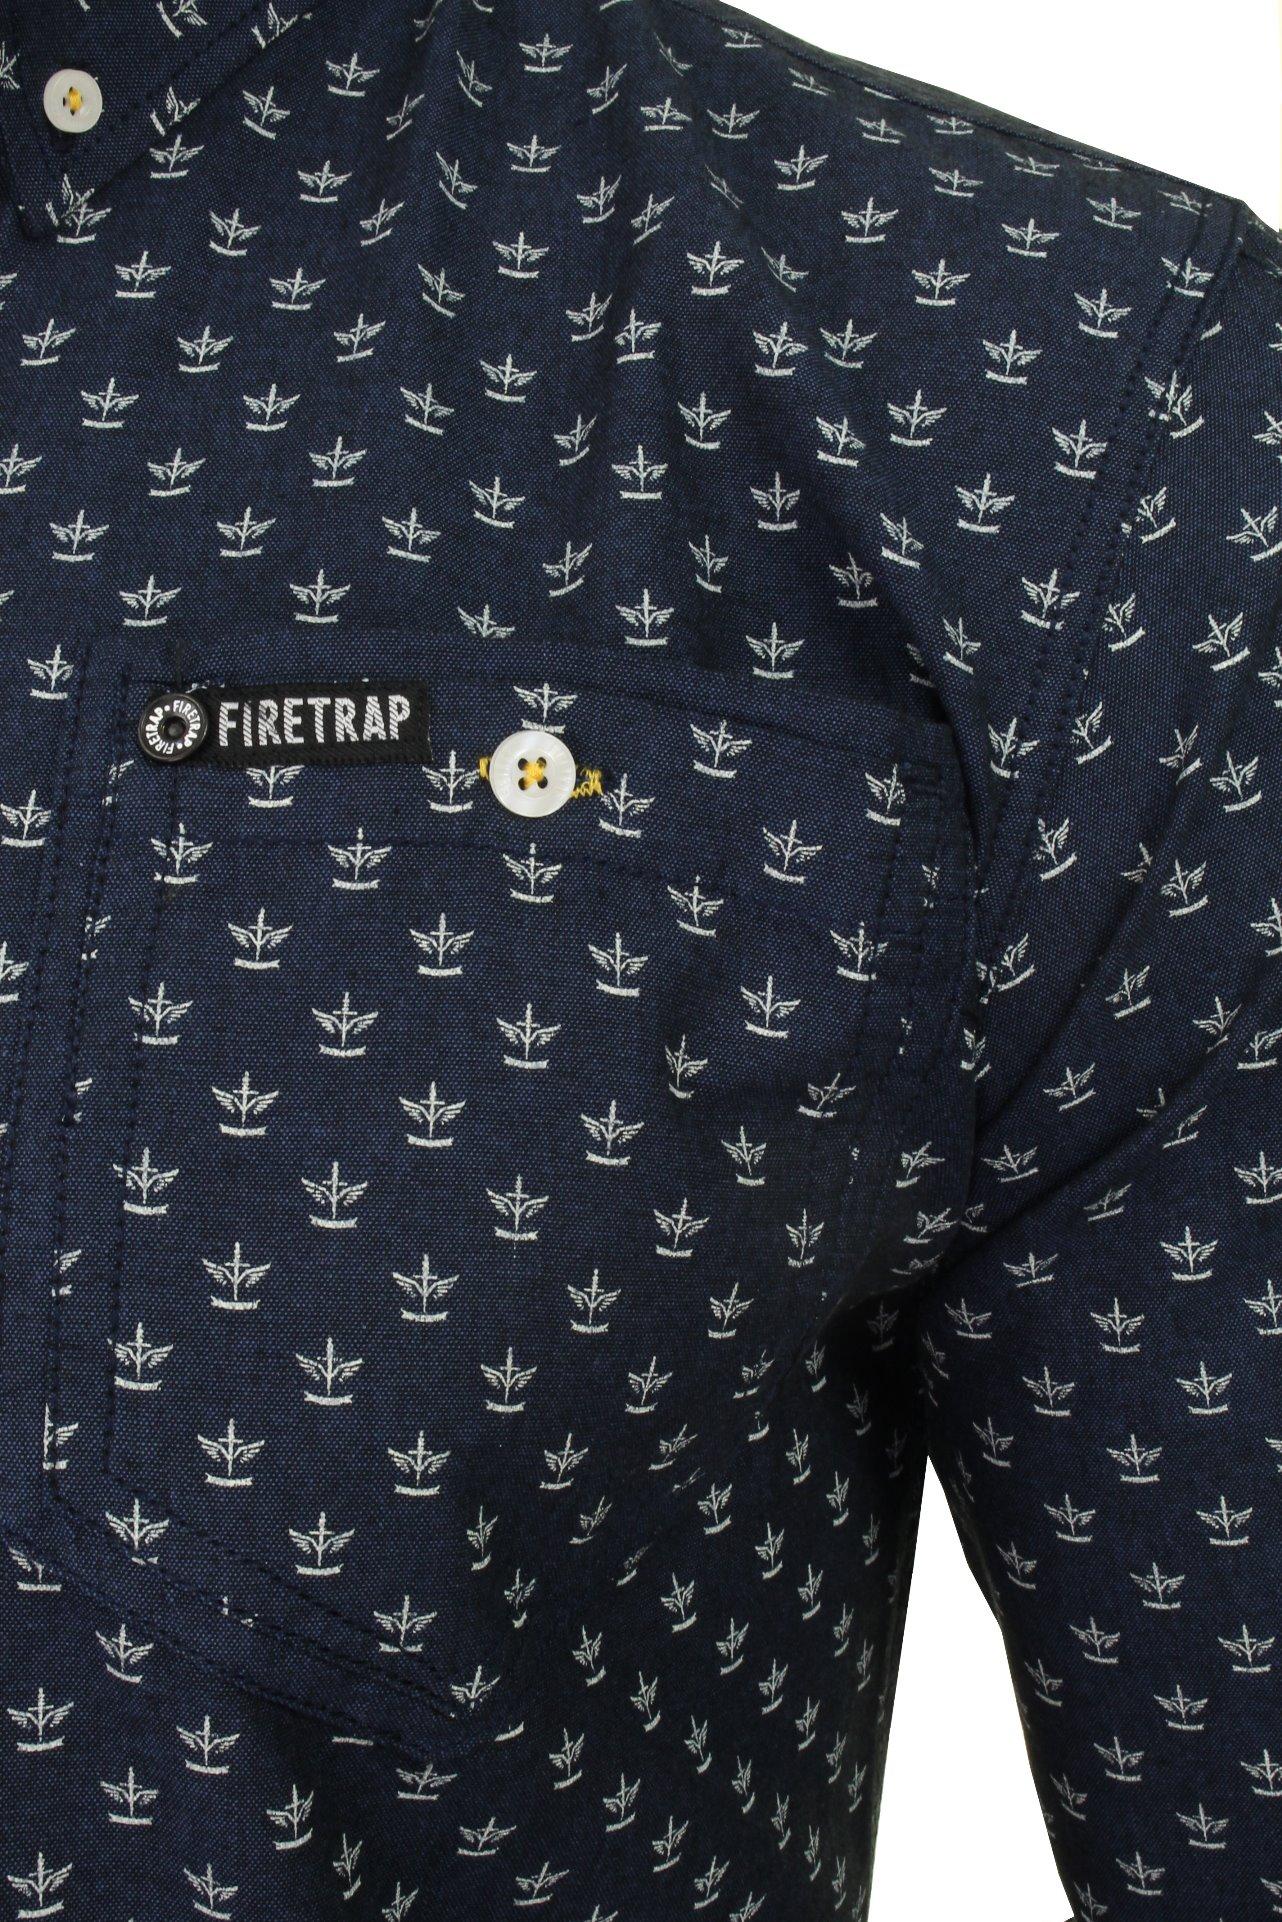 Para-Hombres-Camisa-De-Mezclilla-por-Firetrap-Western-Lavado-Vintage-Manga-Larga miniatura 12